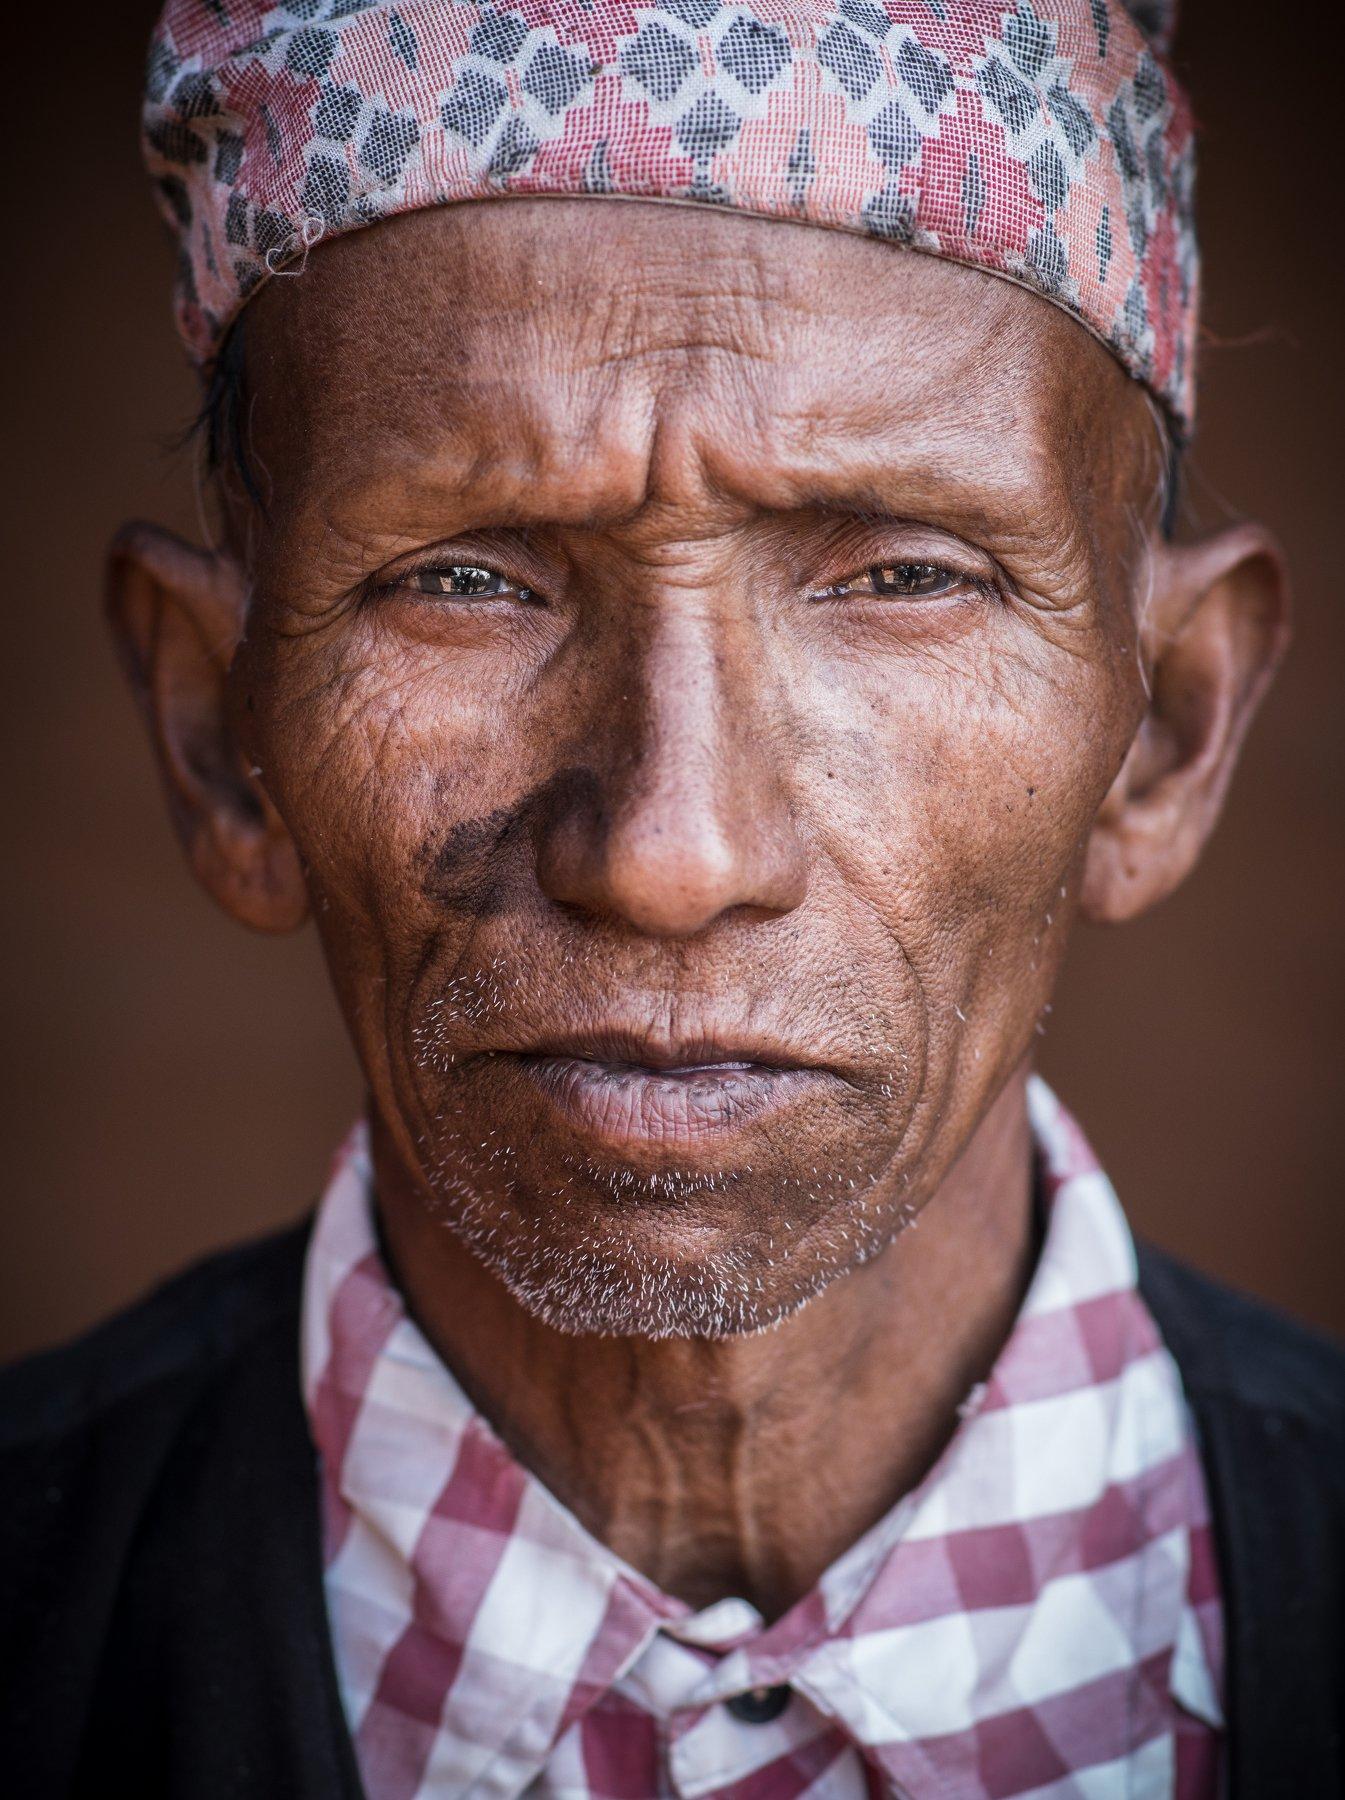 portrait, people, old, urban, man, india, asia, village, kathmandu, nepal, poor, asian, worker, indian, poverty, social, smith, caste, bhaktapur, blacksmith, Герасименко Арсений